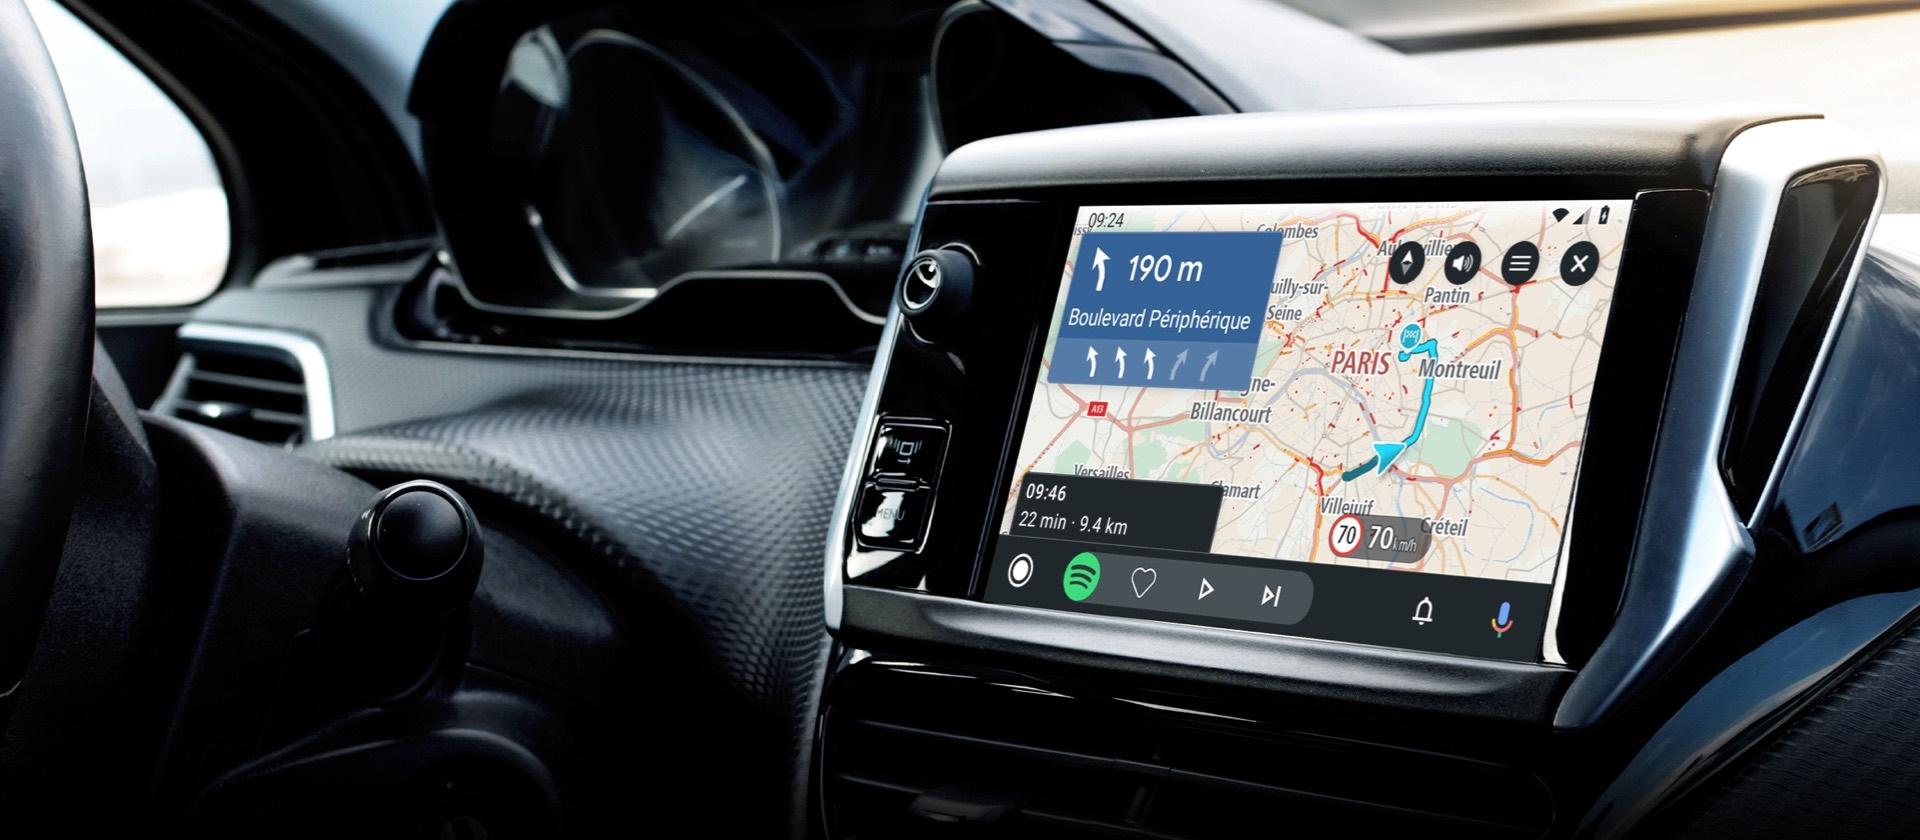 TomTom GO Navigation su Android Auto